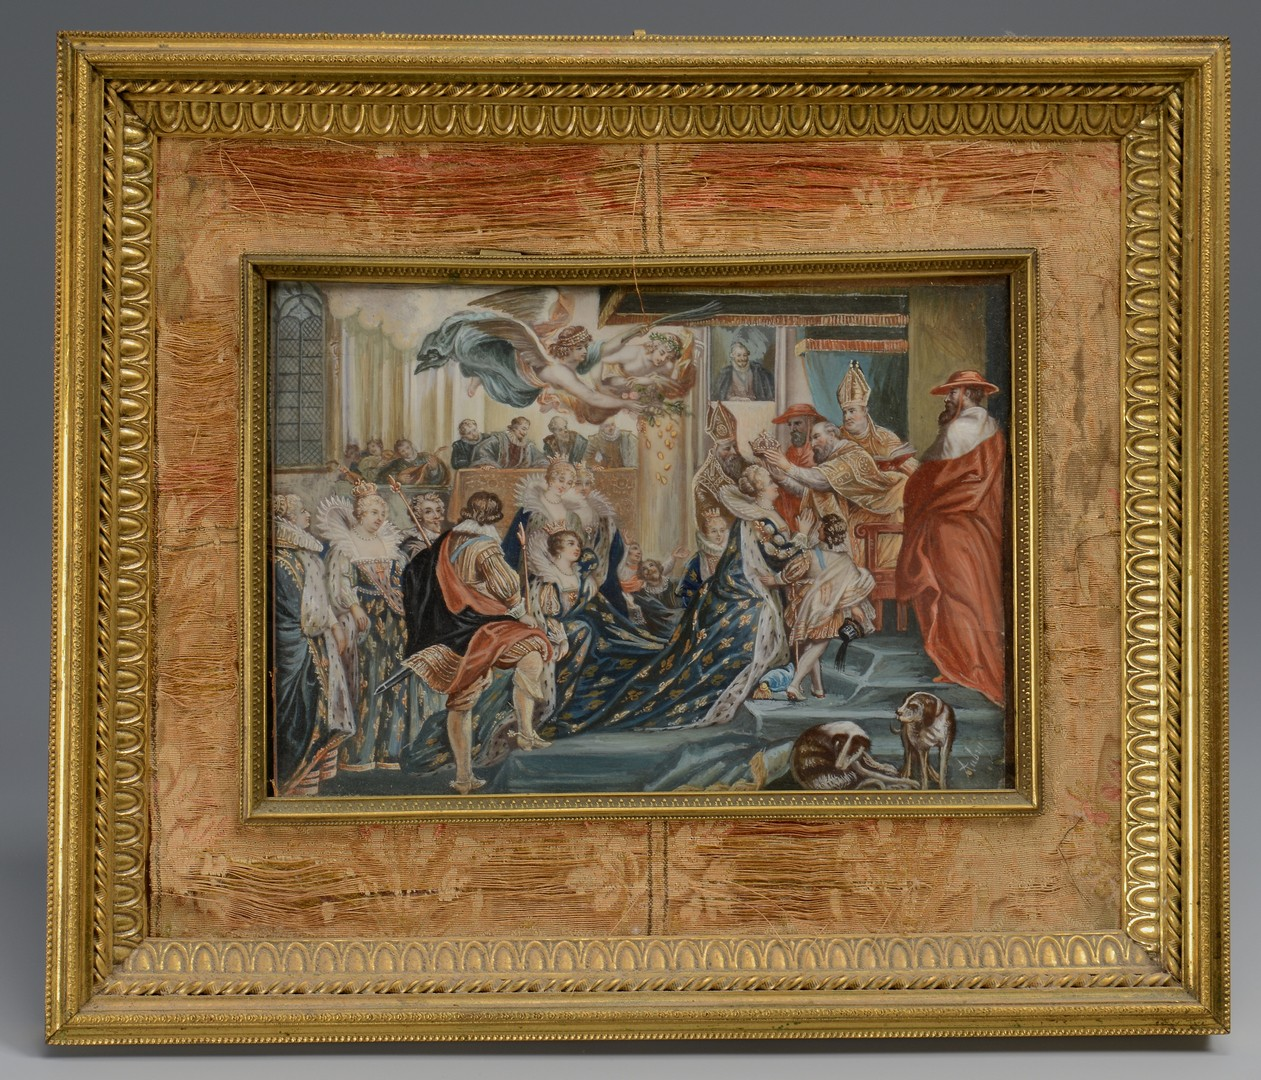 Lot 139: Miniature Coronation Painting, signed